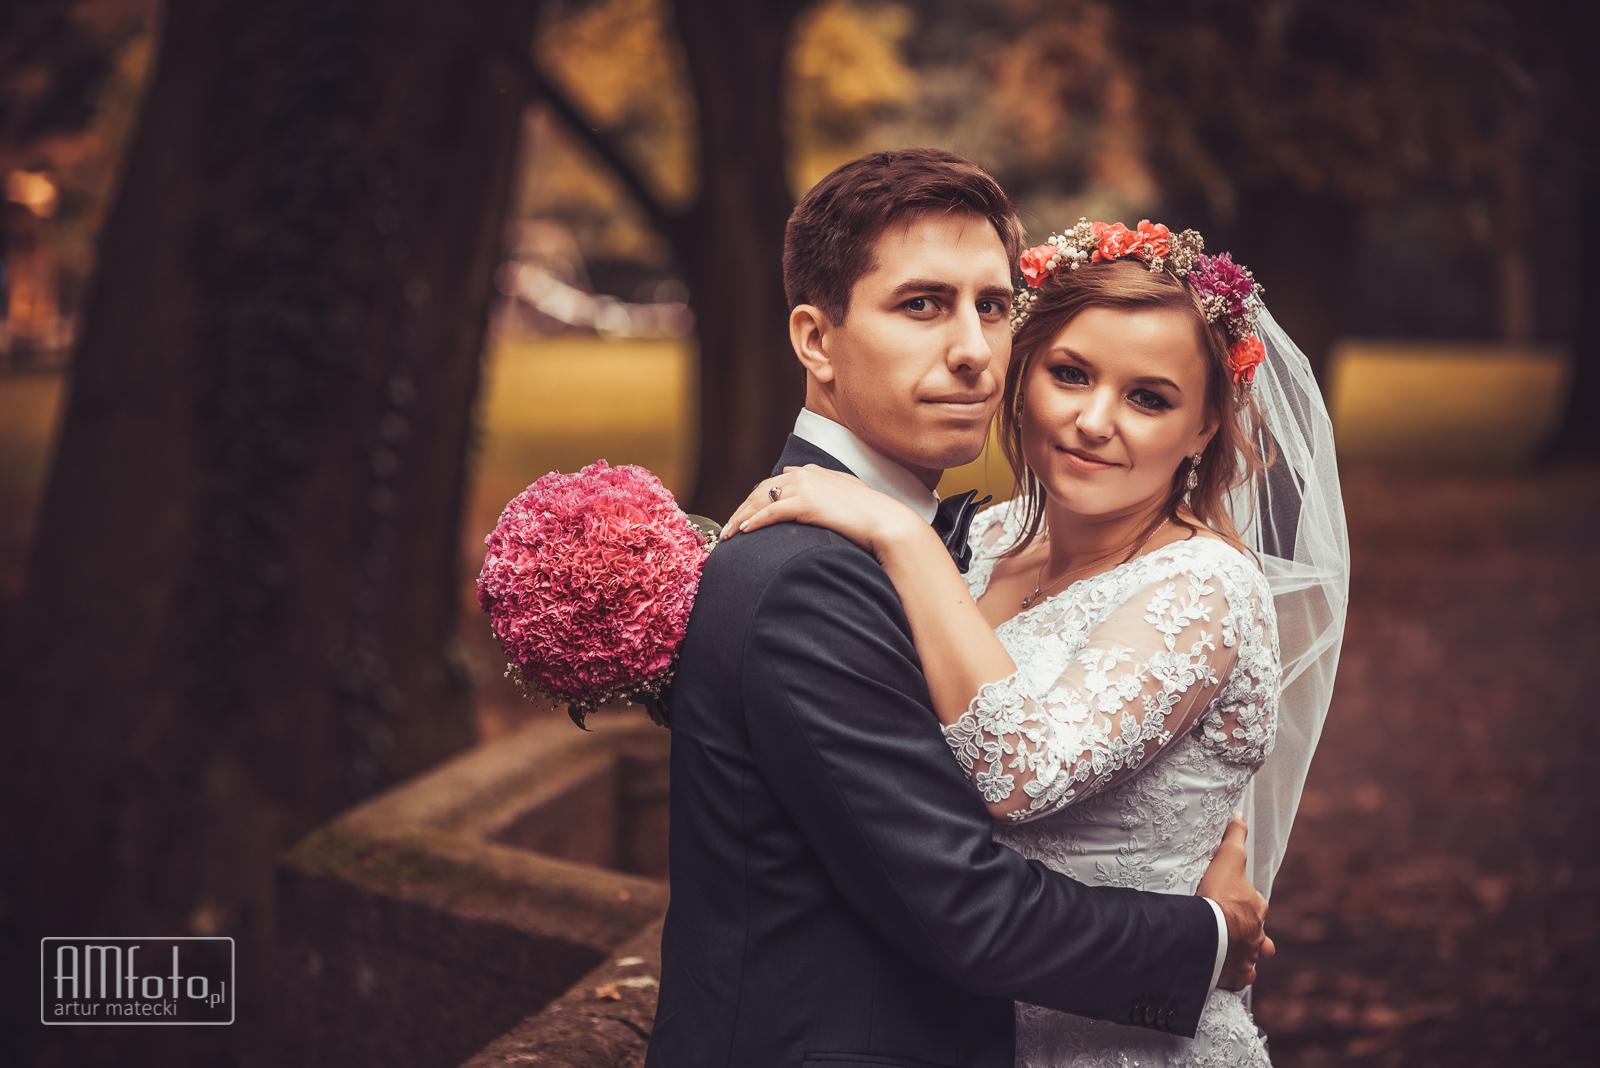 0369_Ilona&Marek_sesja_poslubna_plener_slubny_poznan____www-amfoto-pl__AMF_4190-2.jpg